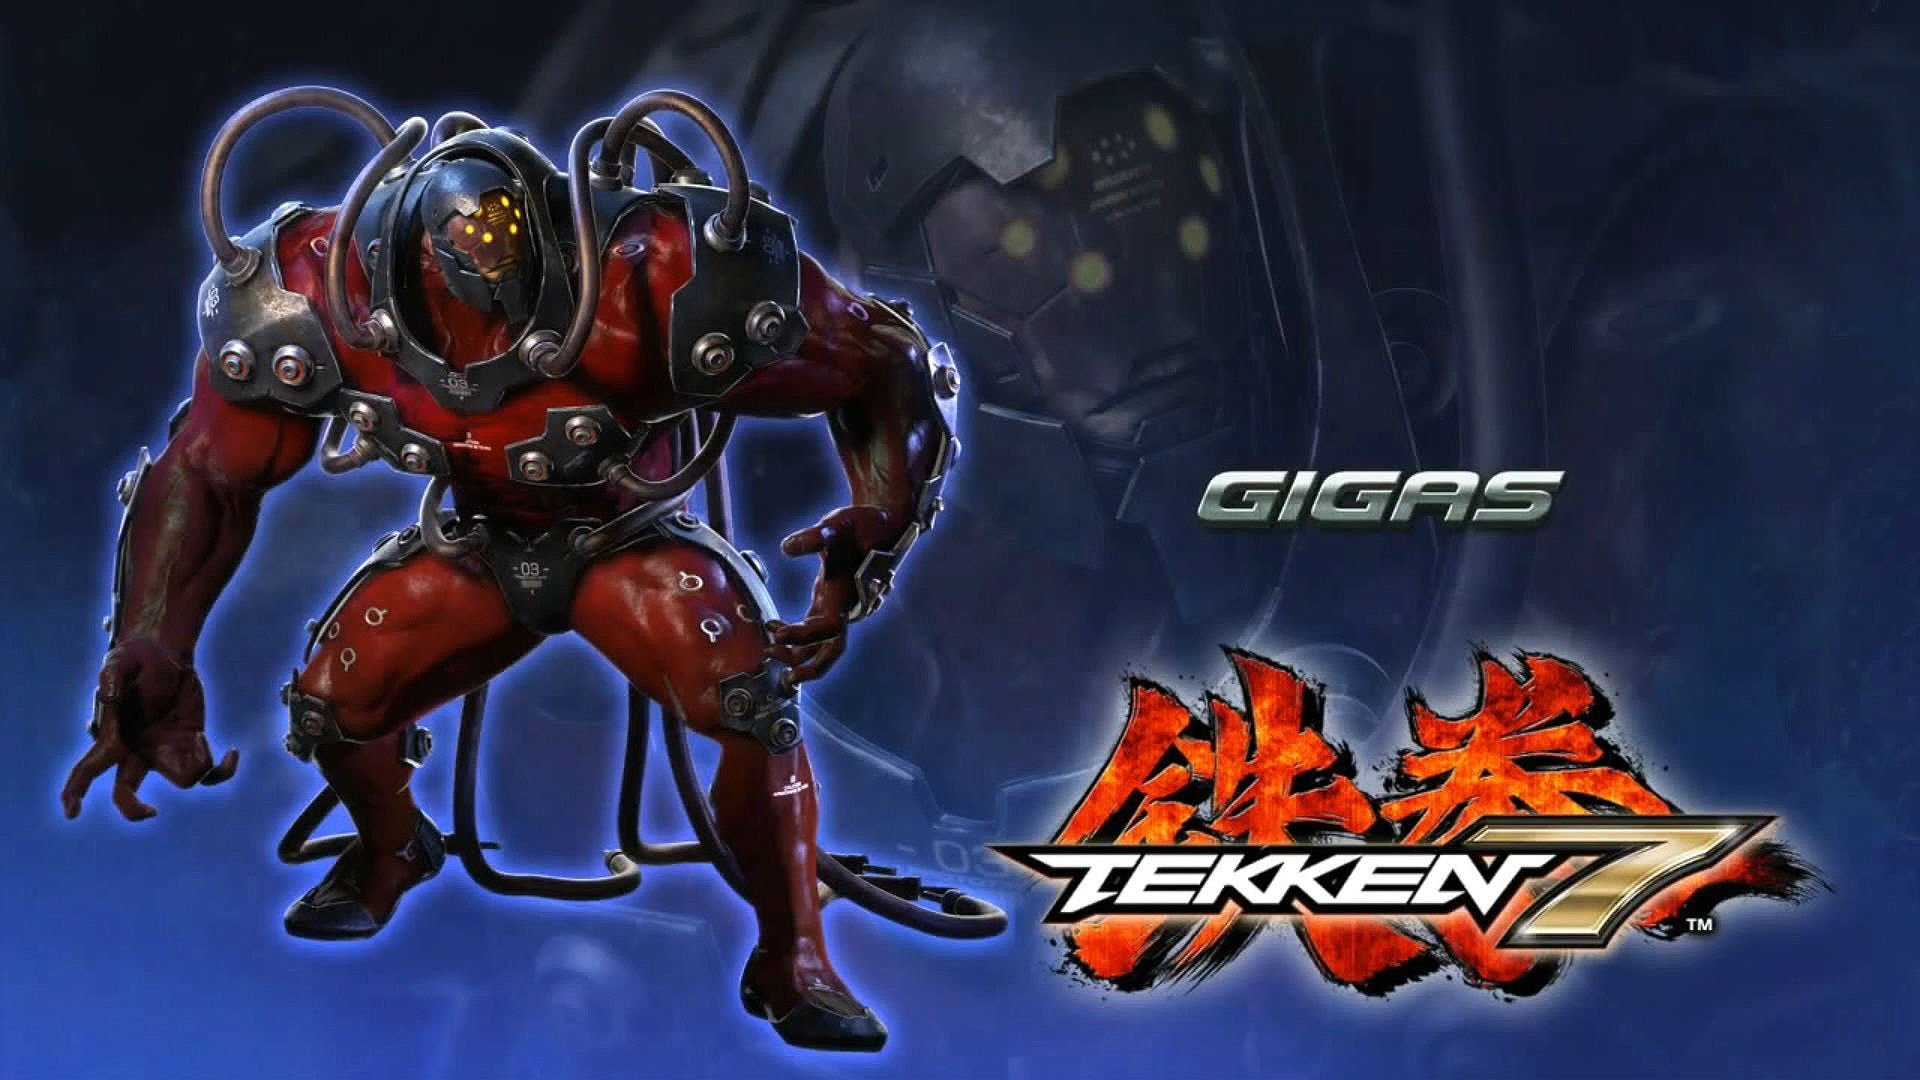 Tekken 7 Wallpapers Images Photos Pictures Backgrounds